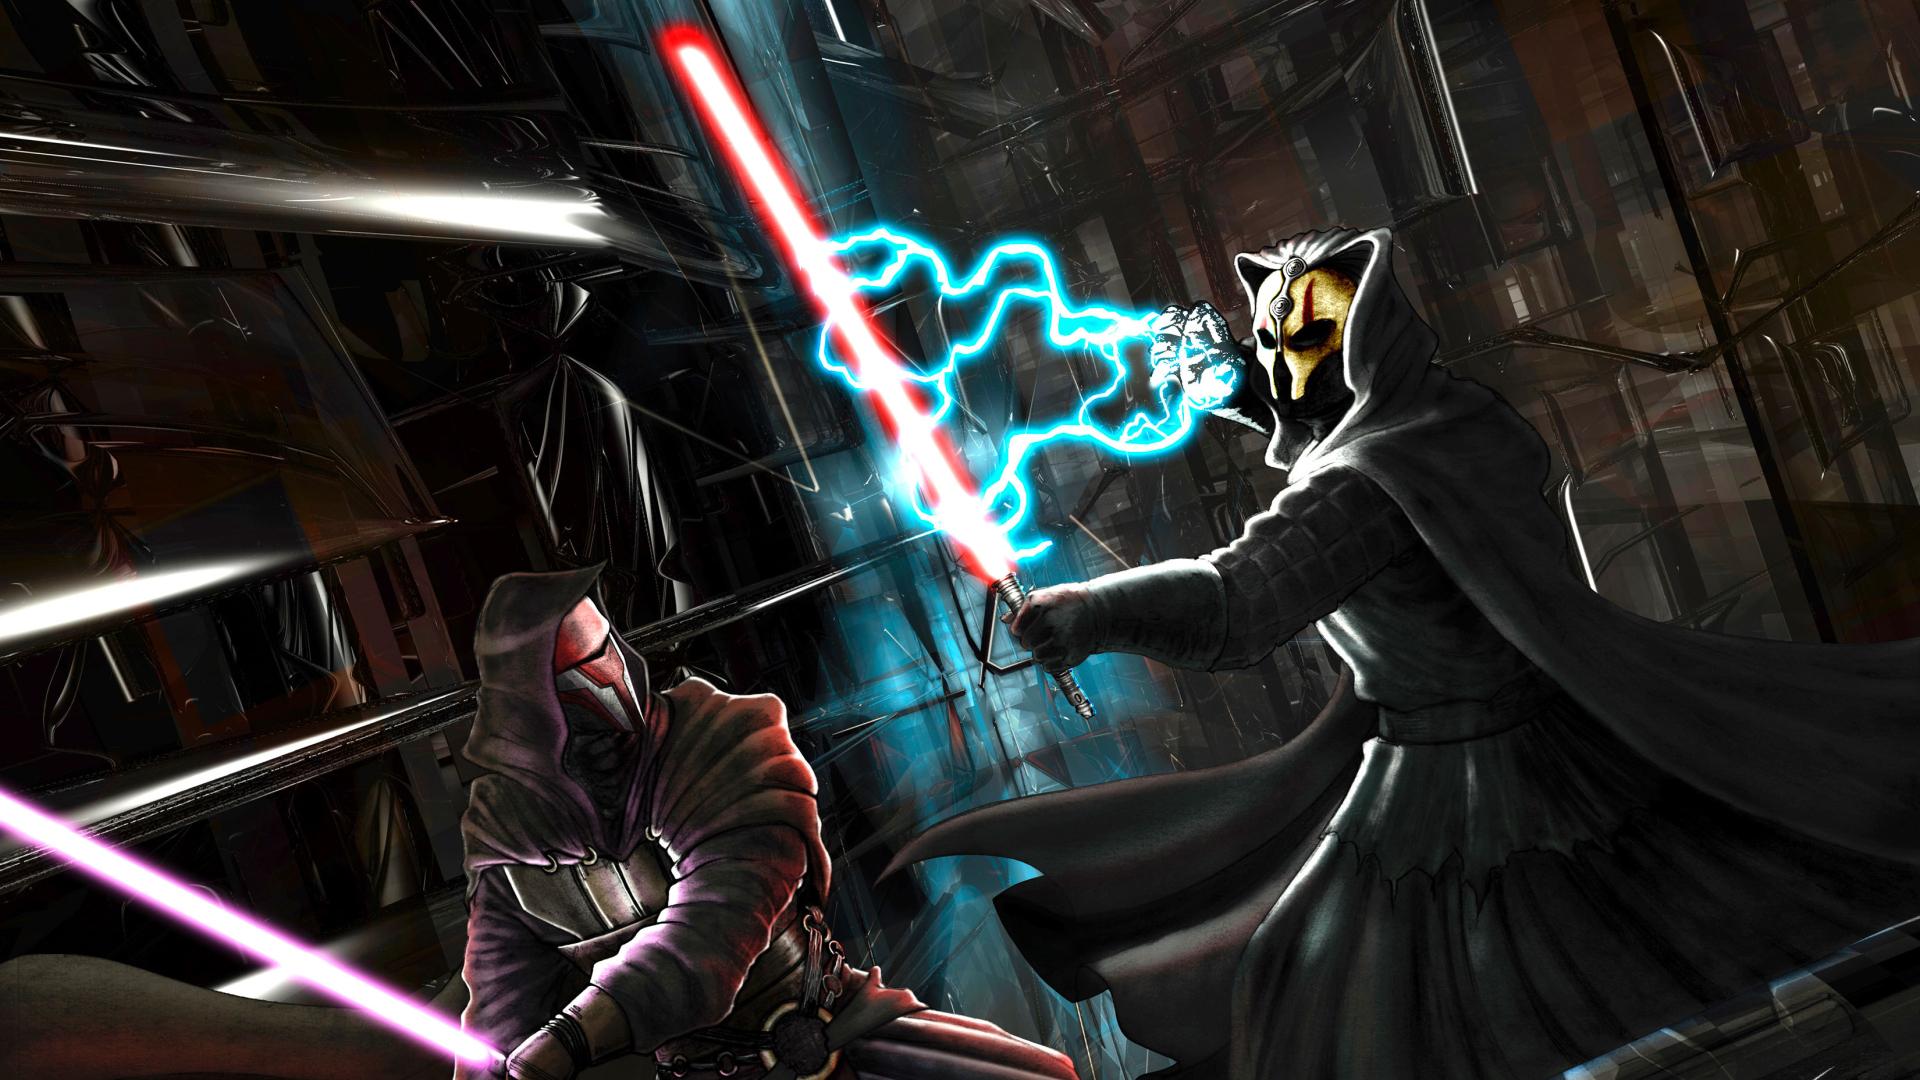 knights of the old republic darth vs revan ZmduZW2UmZqaraWkpJRmbmdlrWZlbWU